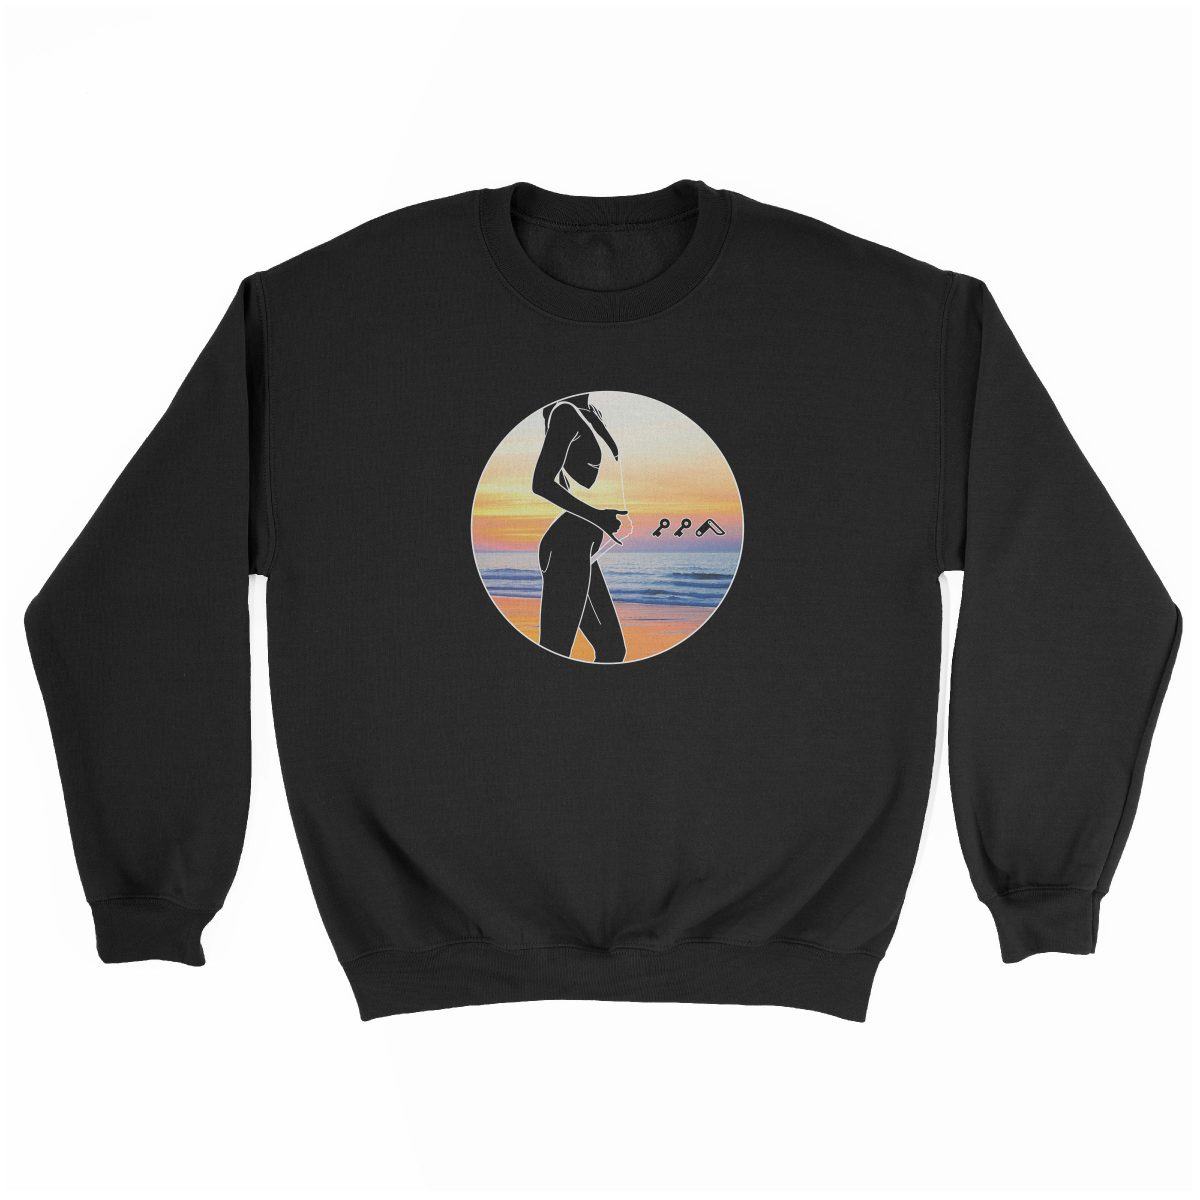 """BAE WATCH"" music festival beach sweatshirt in black"